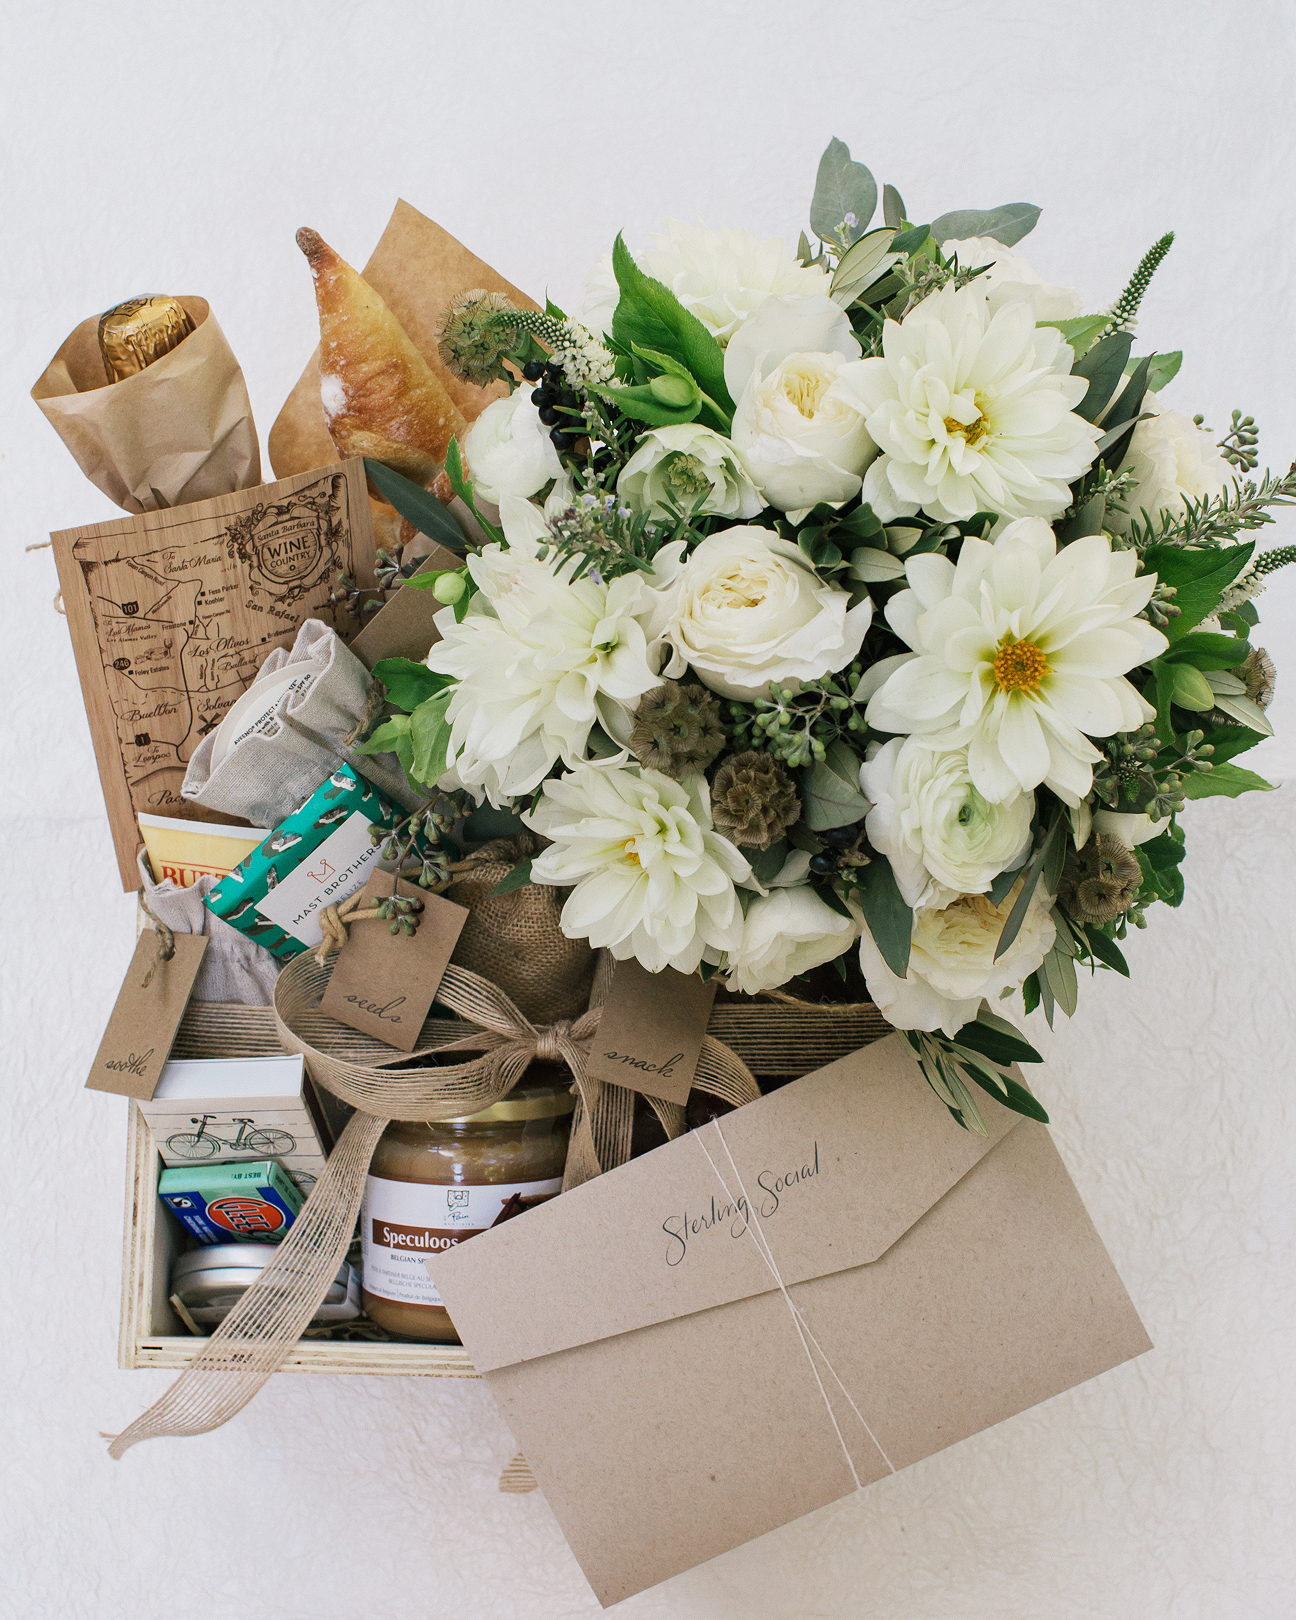 add-flowers-sterling-social-0616.jpg